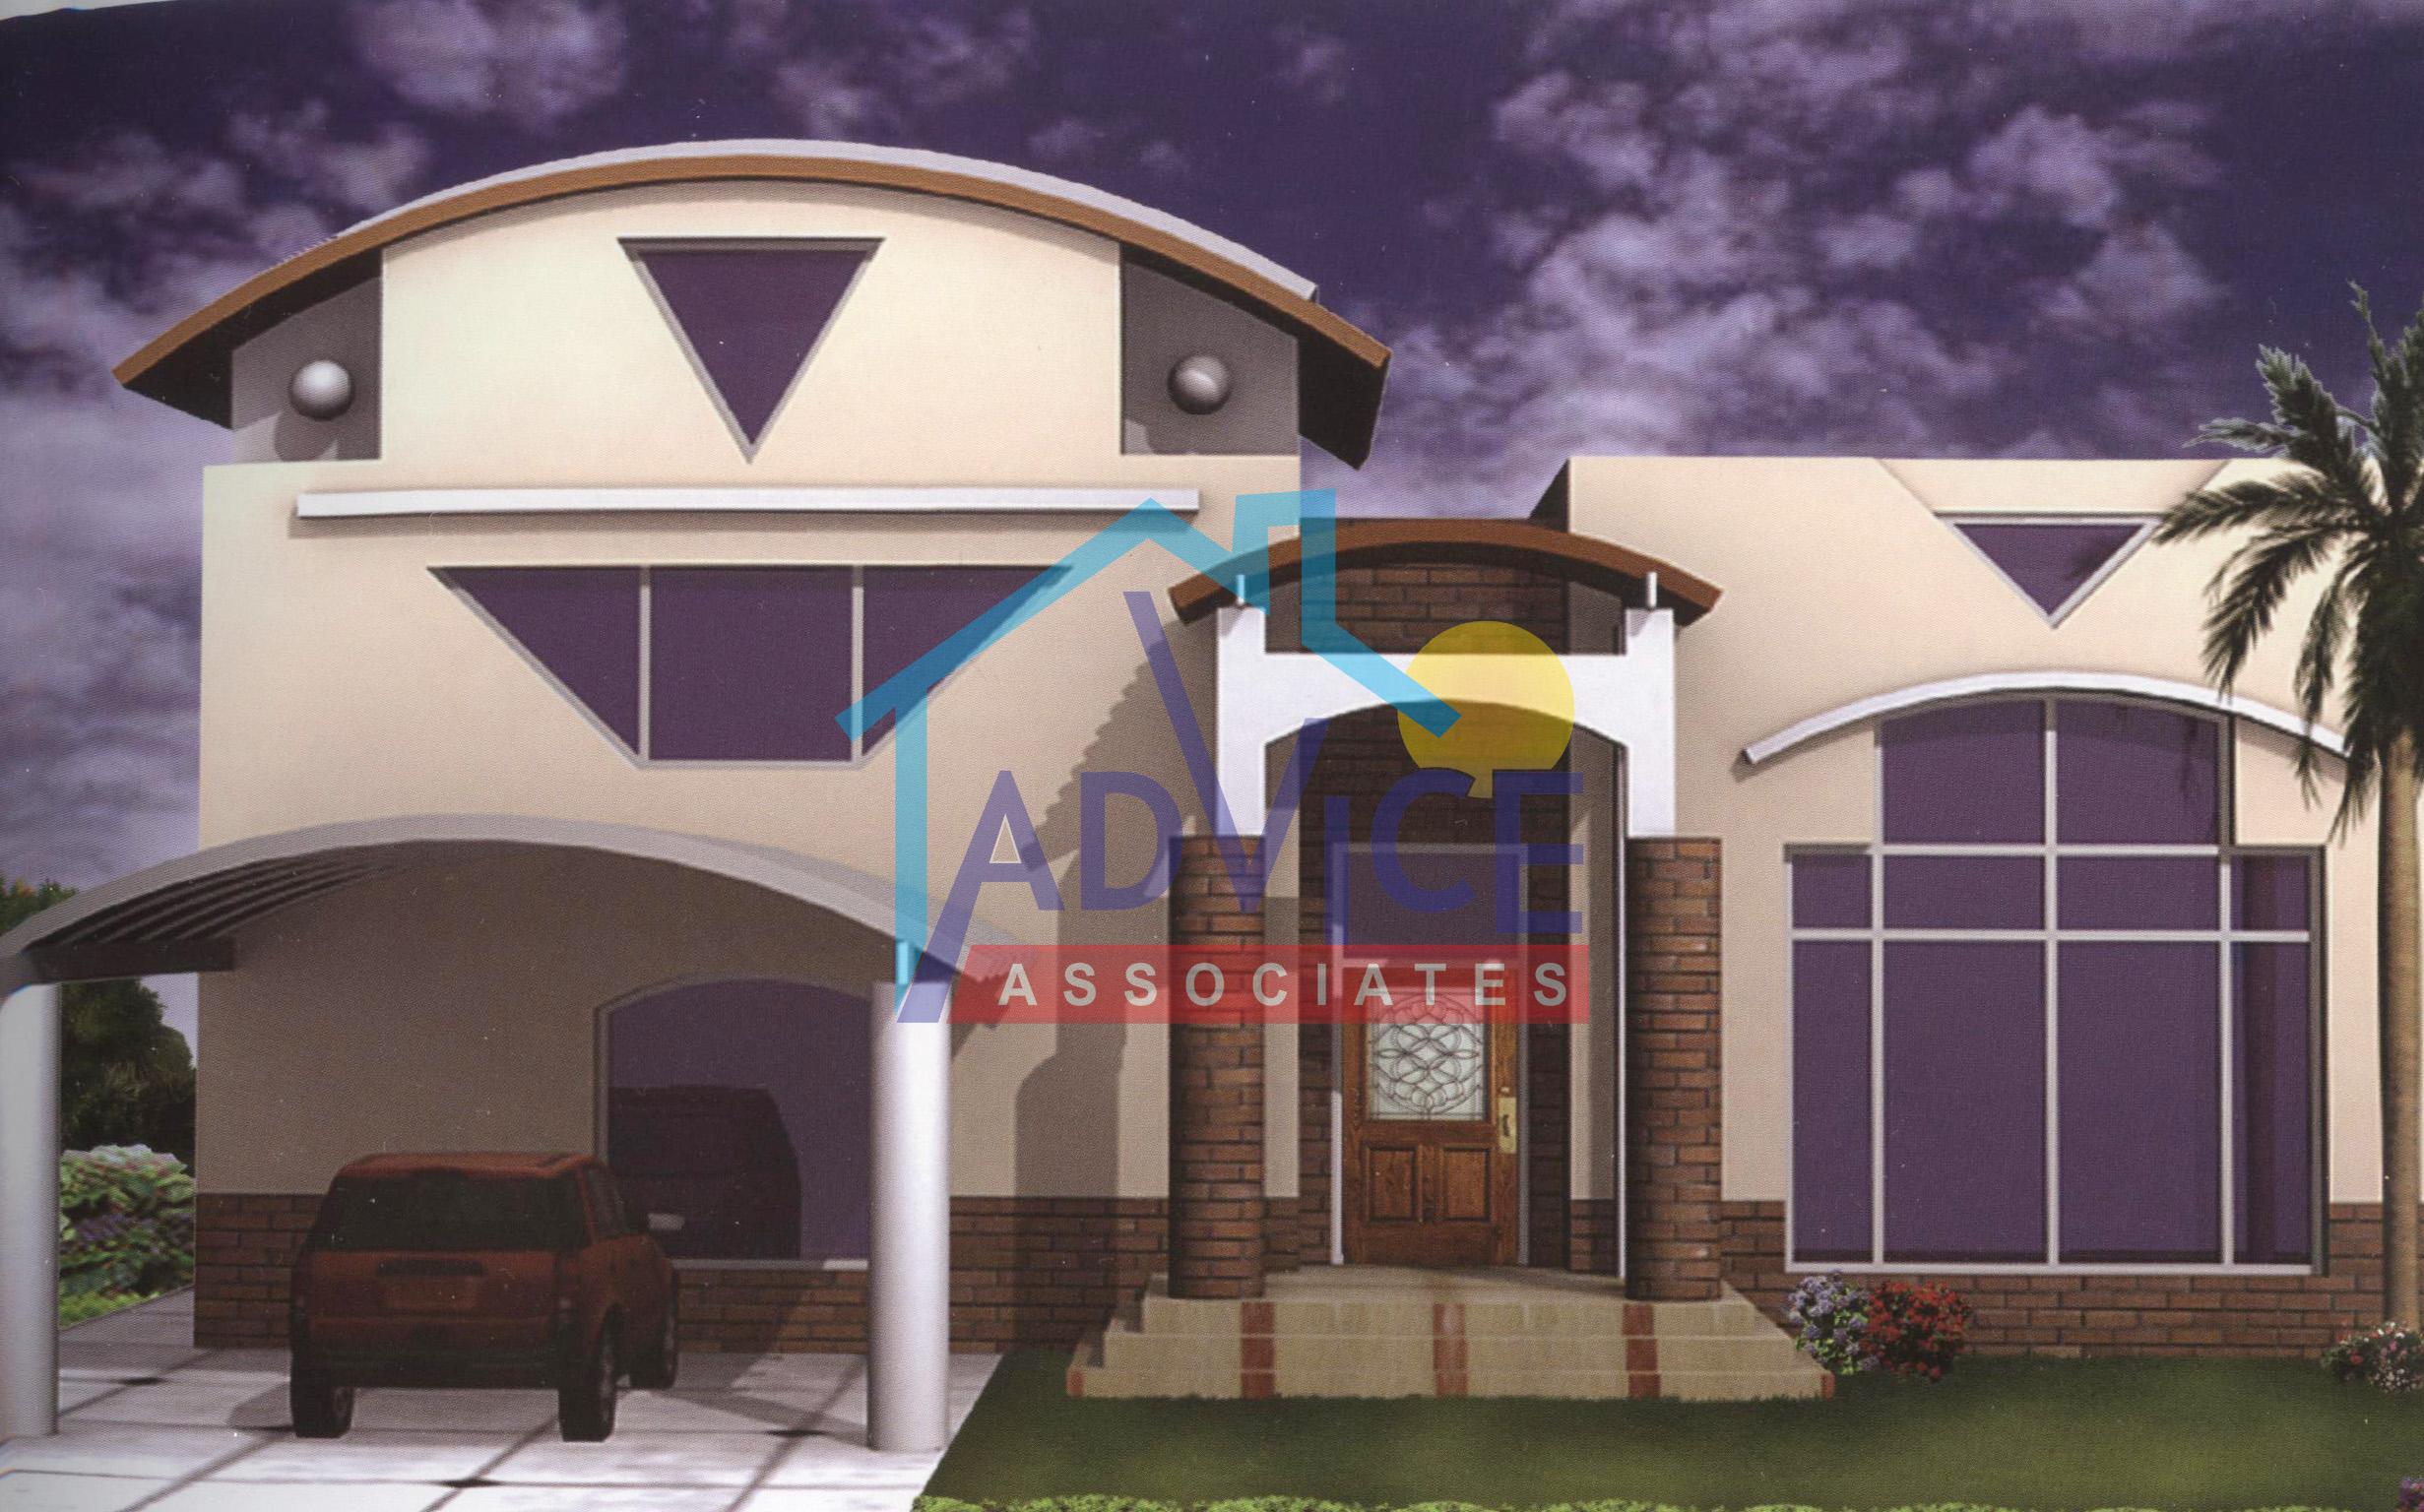 House Design 5 Marla, 10 Marla, 1 Knal In FDA City Faisalabad